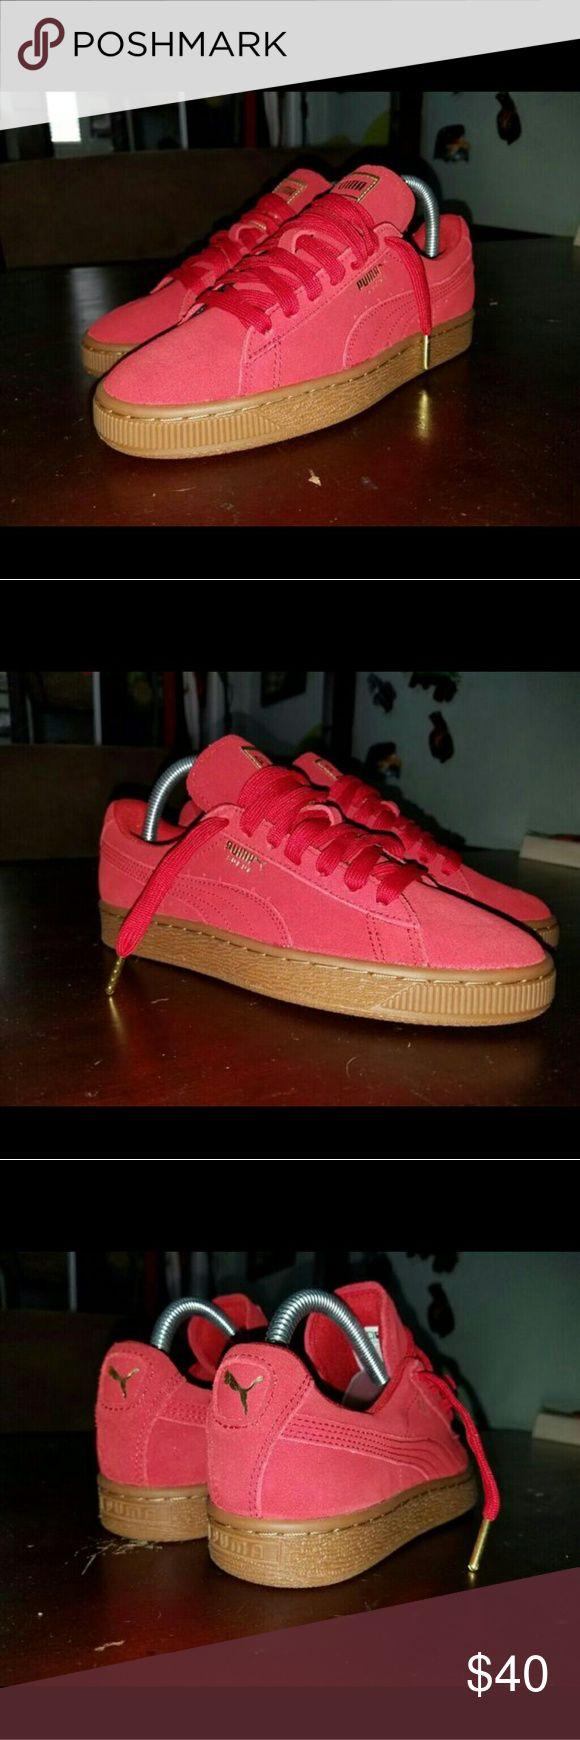 Puma suede sz 6.5 women's Red suede Gum bottom  Gold lace locks No box SZ 6.5 women's Puma Shoes Sneakers